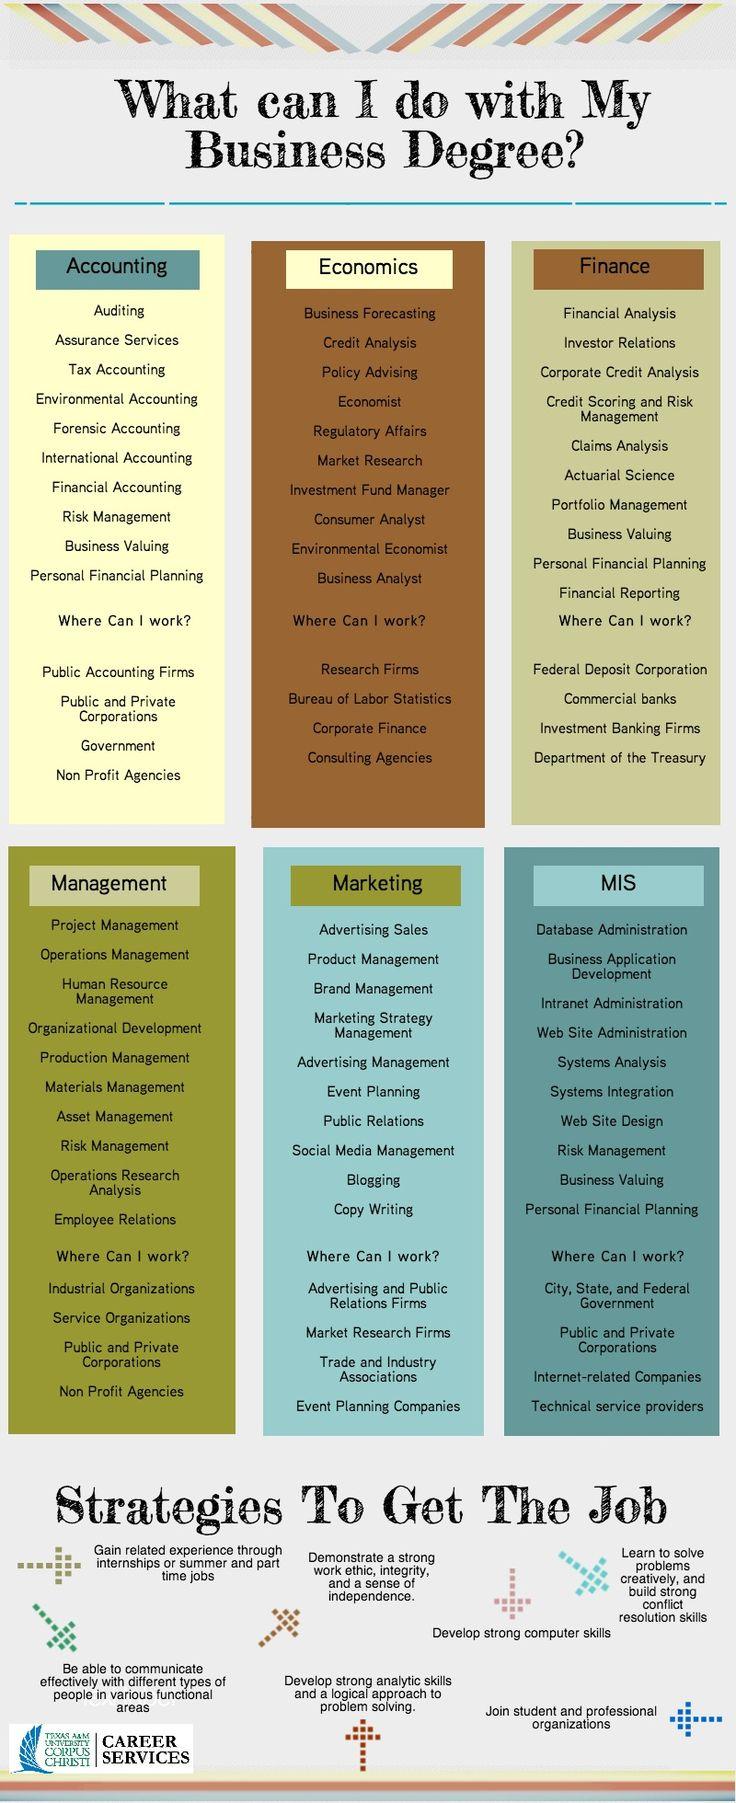 Texas A University-Corpus Christi - Career Services #careers